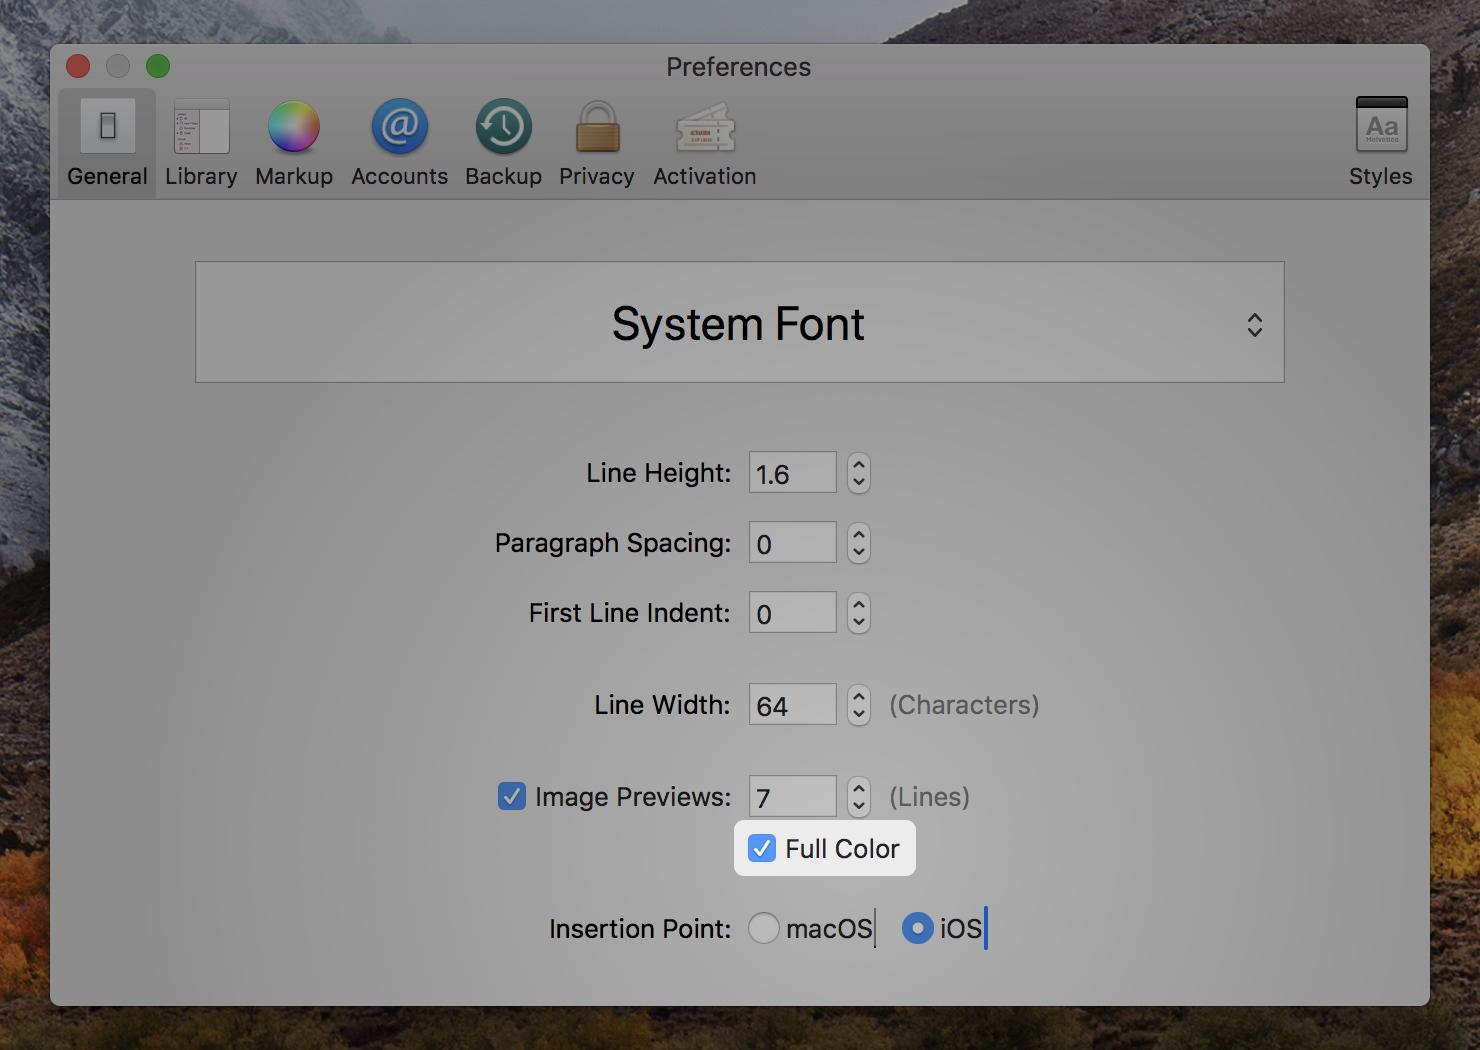 macOS General Preference menu